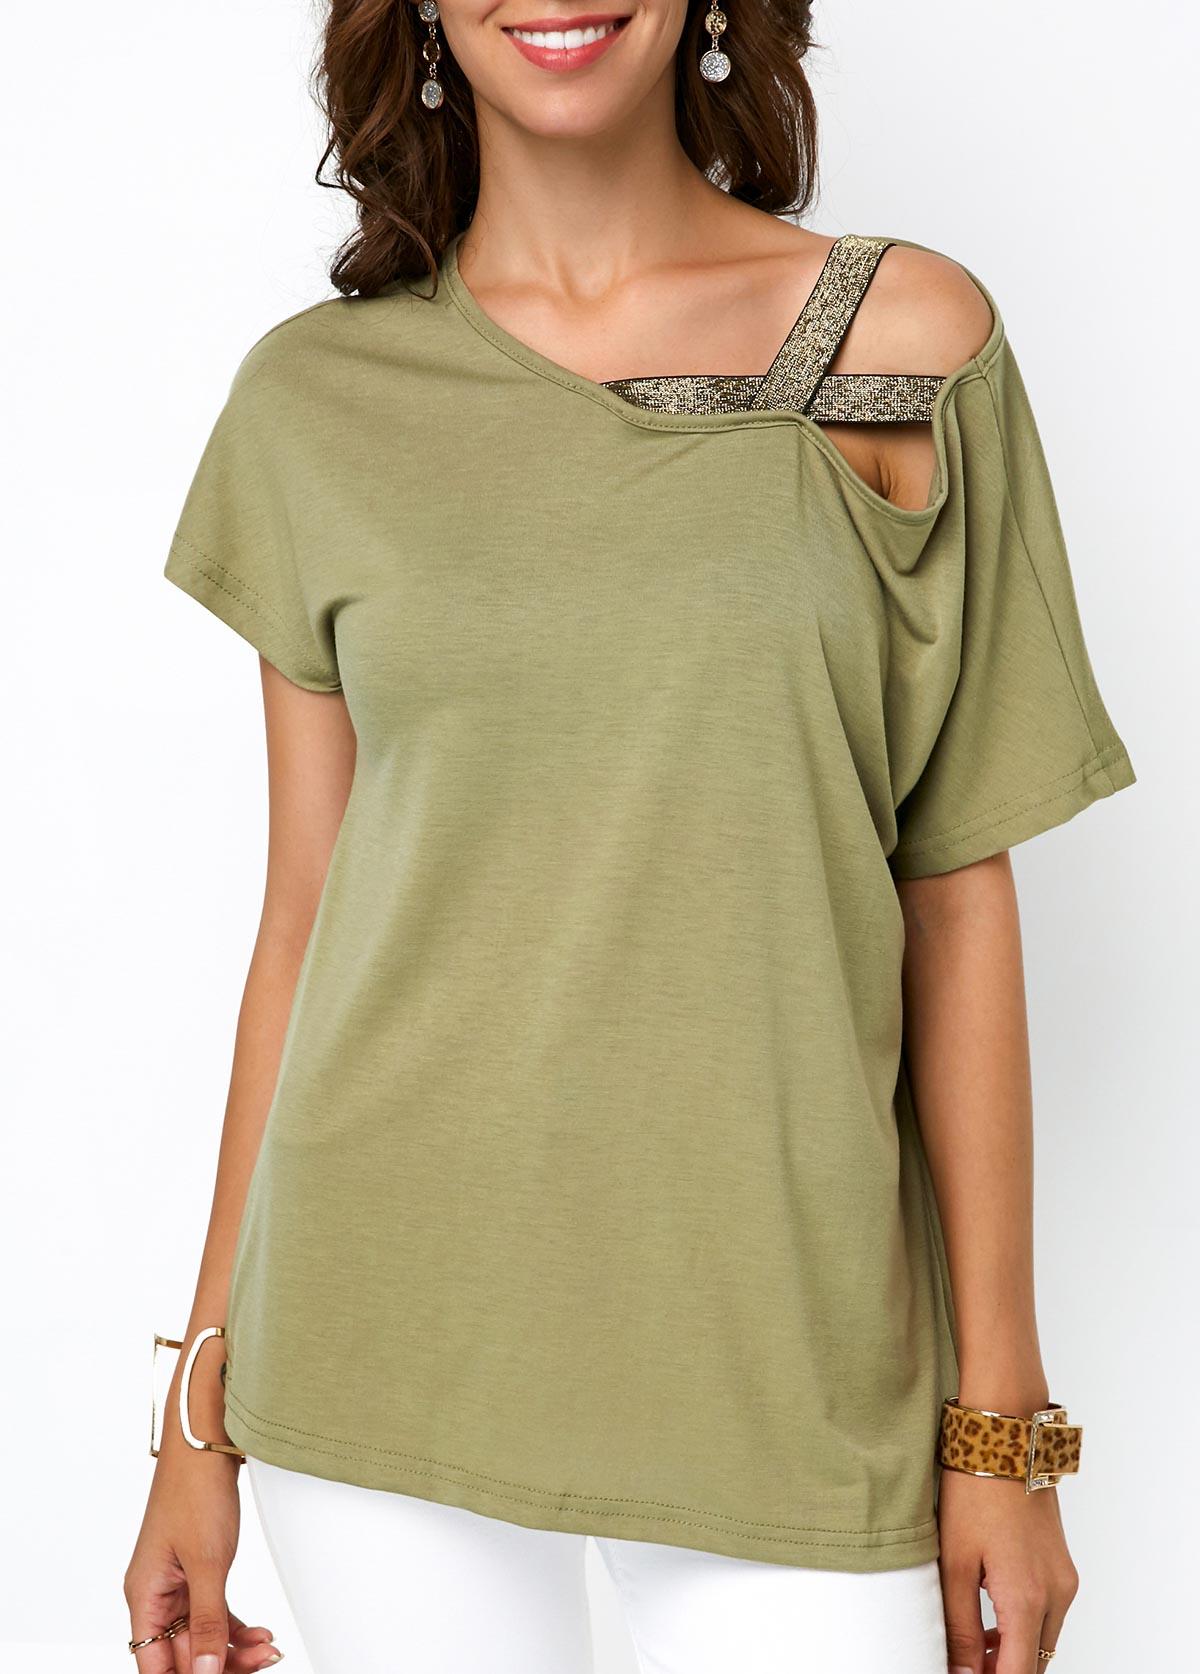 ROTITA Army Green Short Sleeve T Shirt